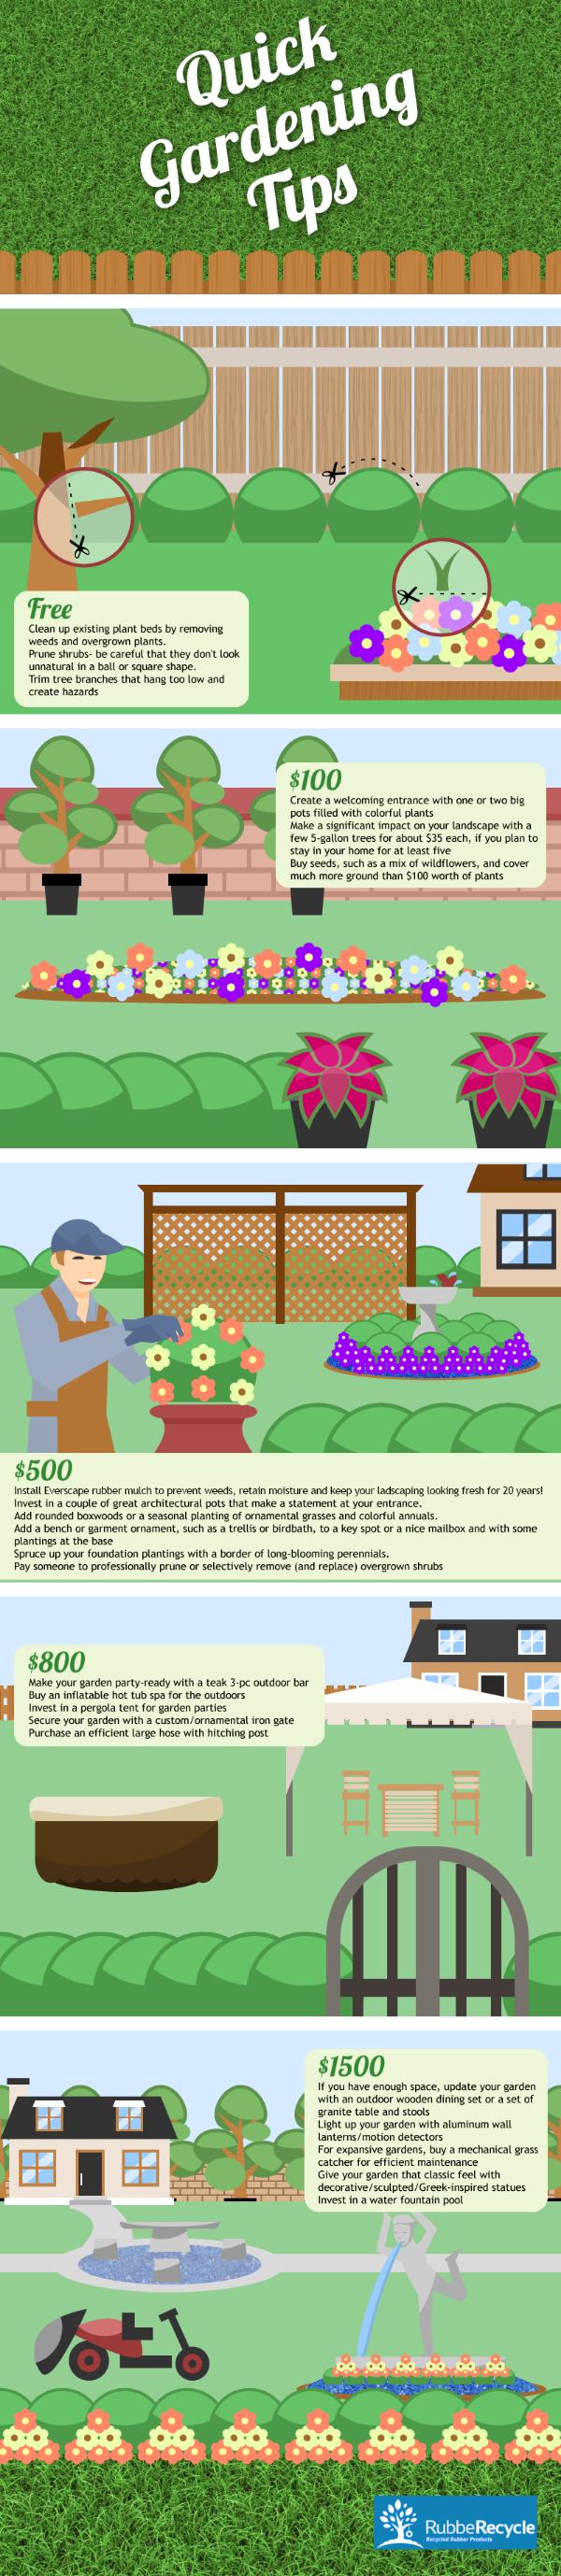 Quick Gardening Tips.jpg